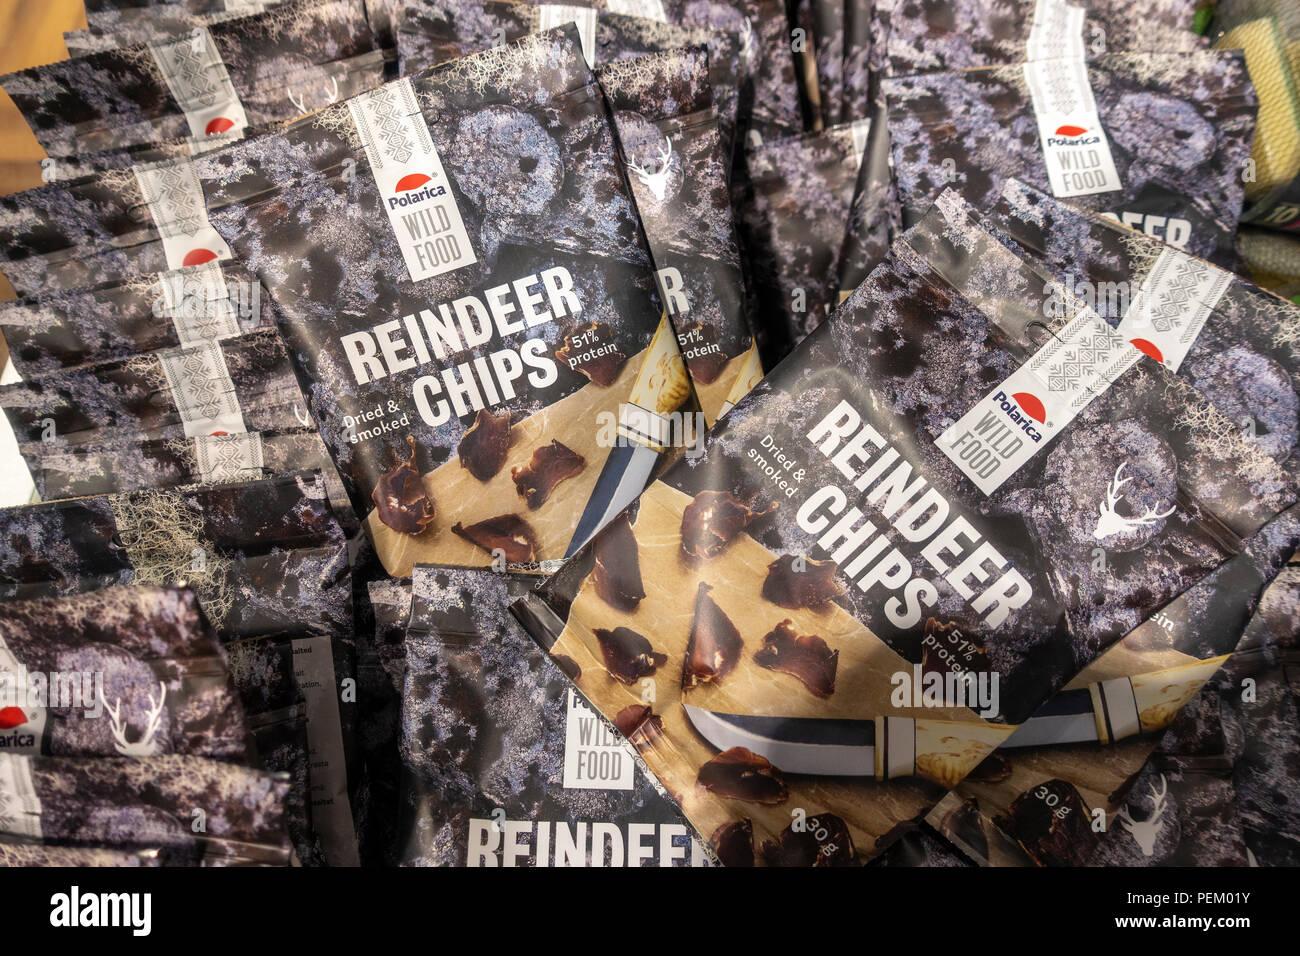 Finnish Lapland food: bags of Reindeer Chips; Reindeer Crisps for sale in Helsinki Finland. - Stock Image